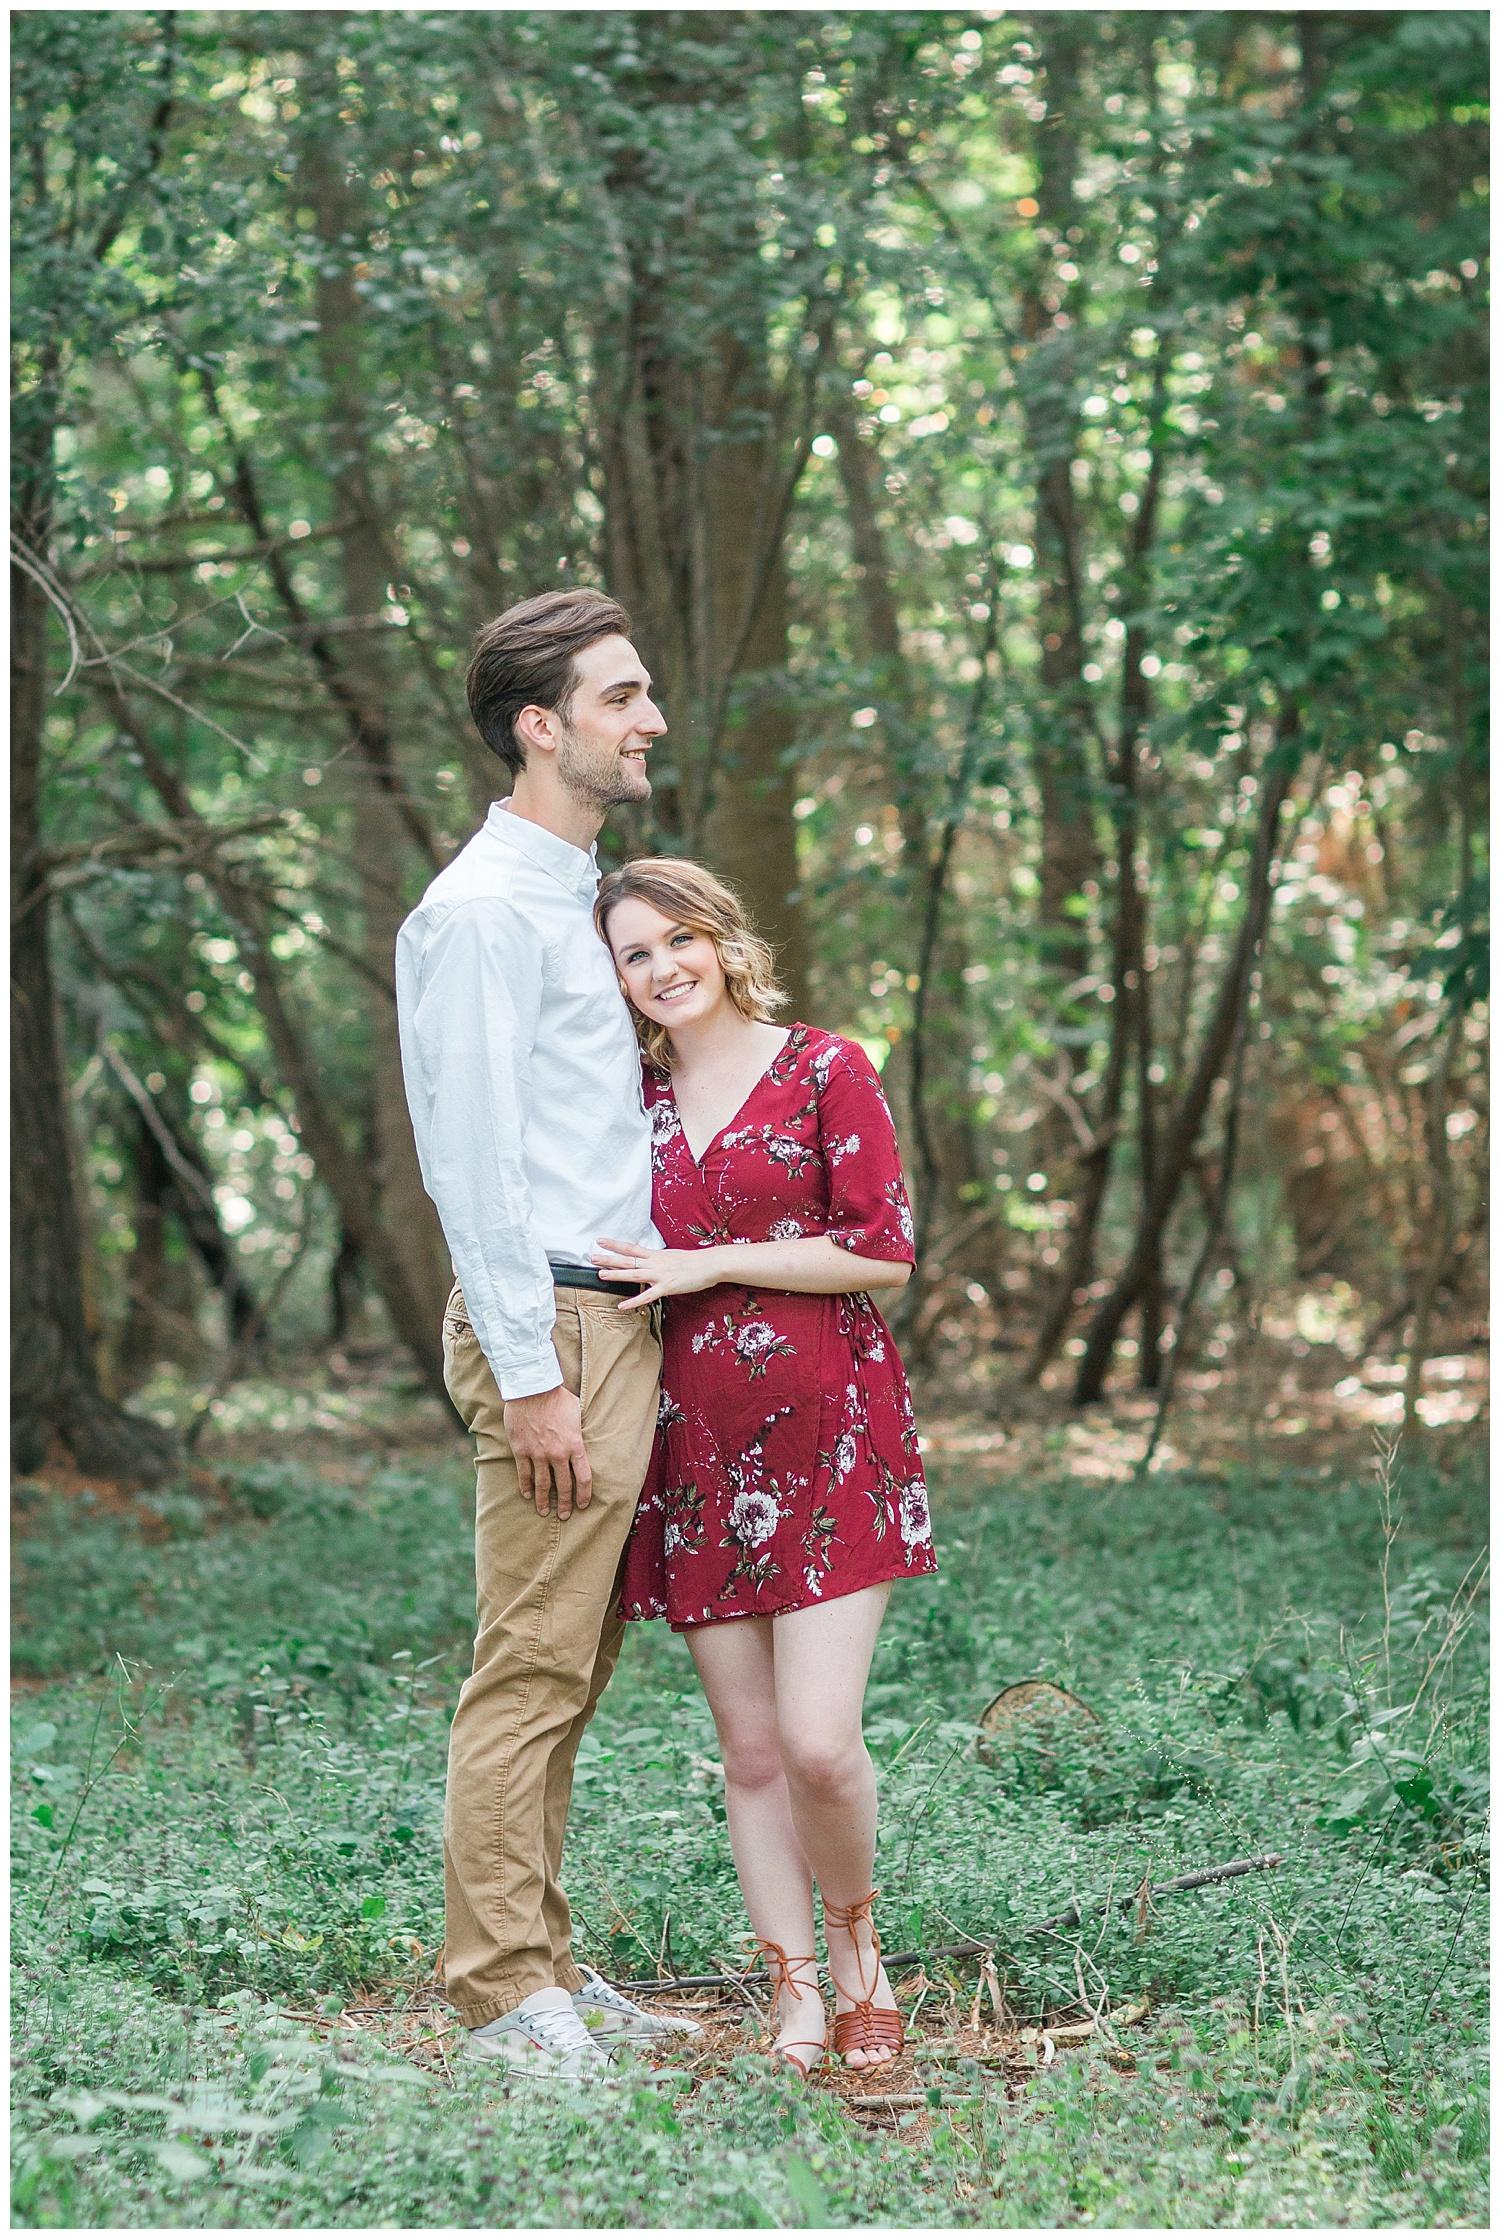 Tanya and Ryan - Sweetheart session - Lass & Beau - Geneseo NY-38_Buffalo wedding photography.jpg